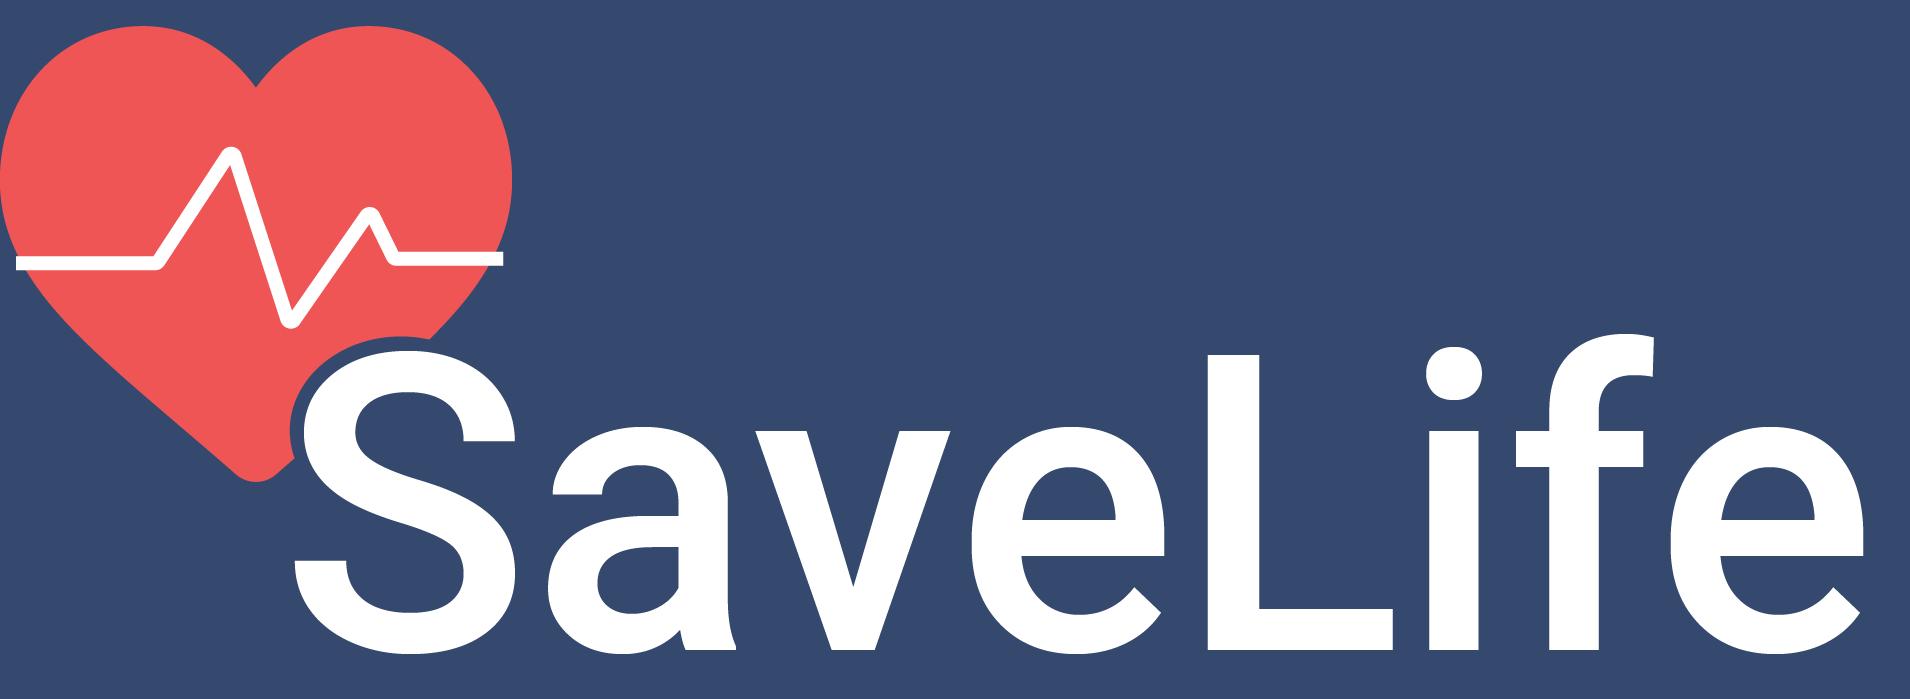 Savelife Logga